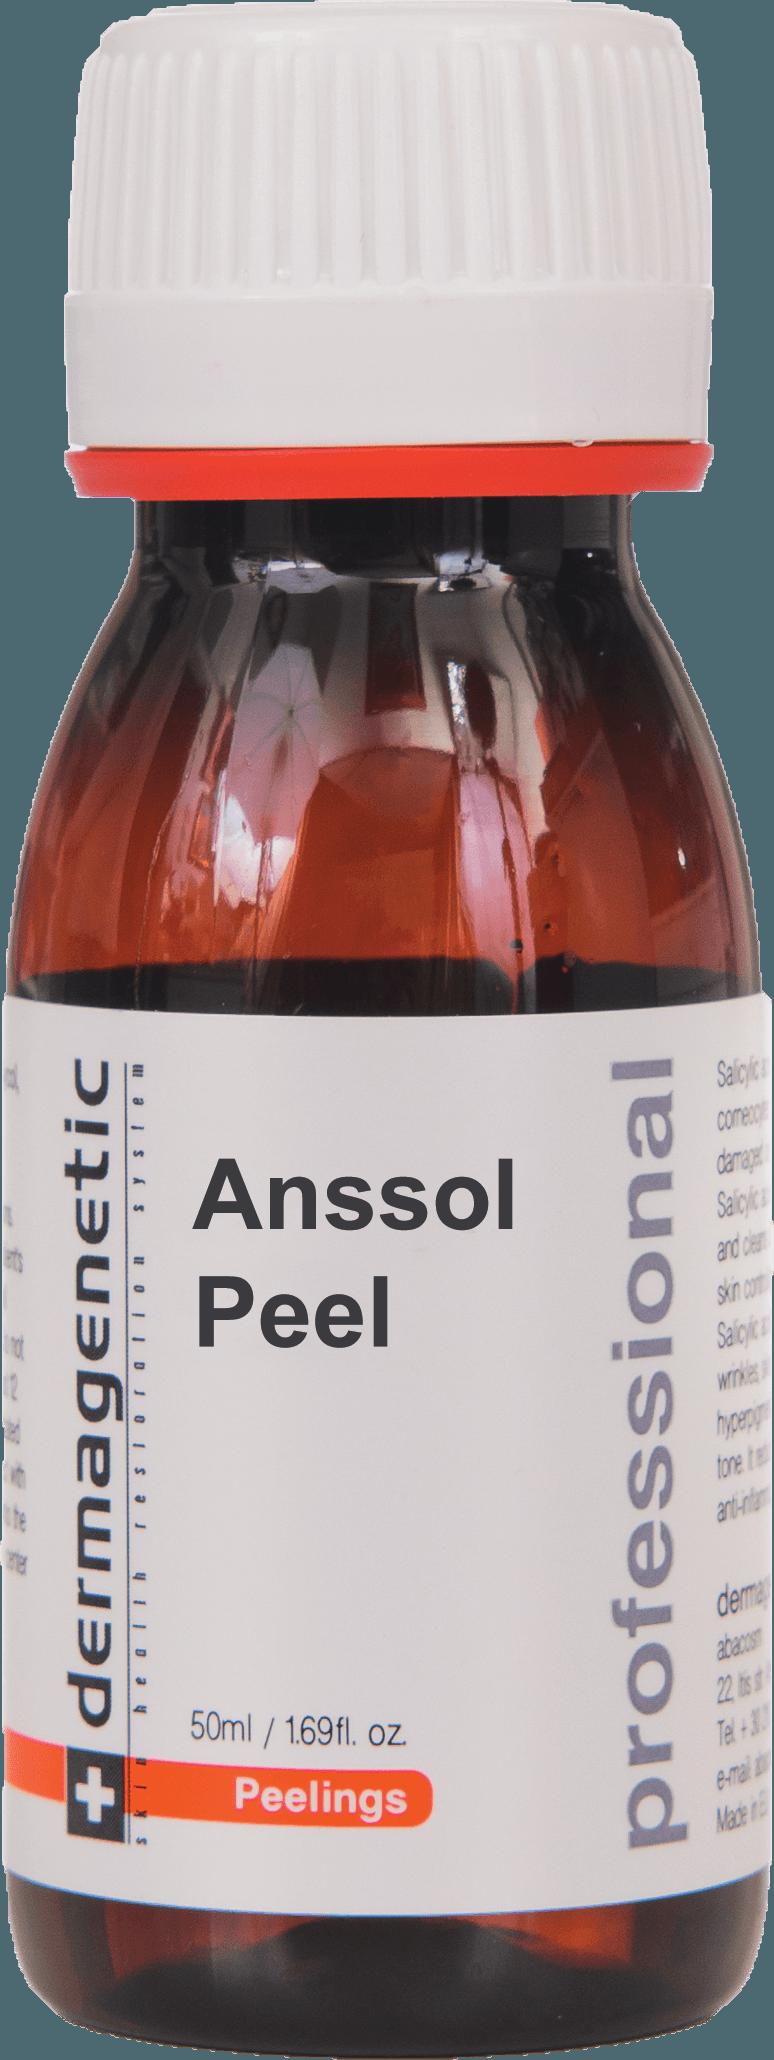 Anssol Peel